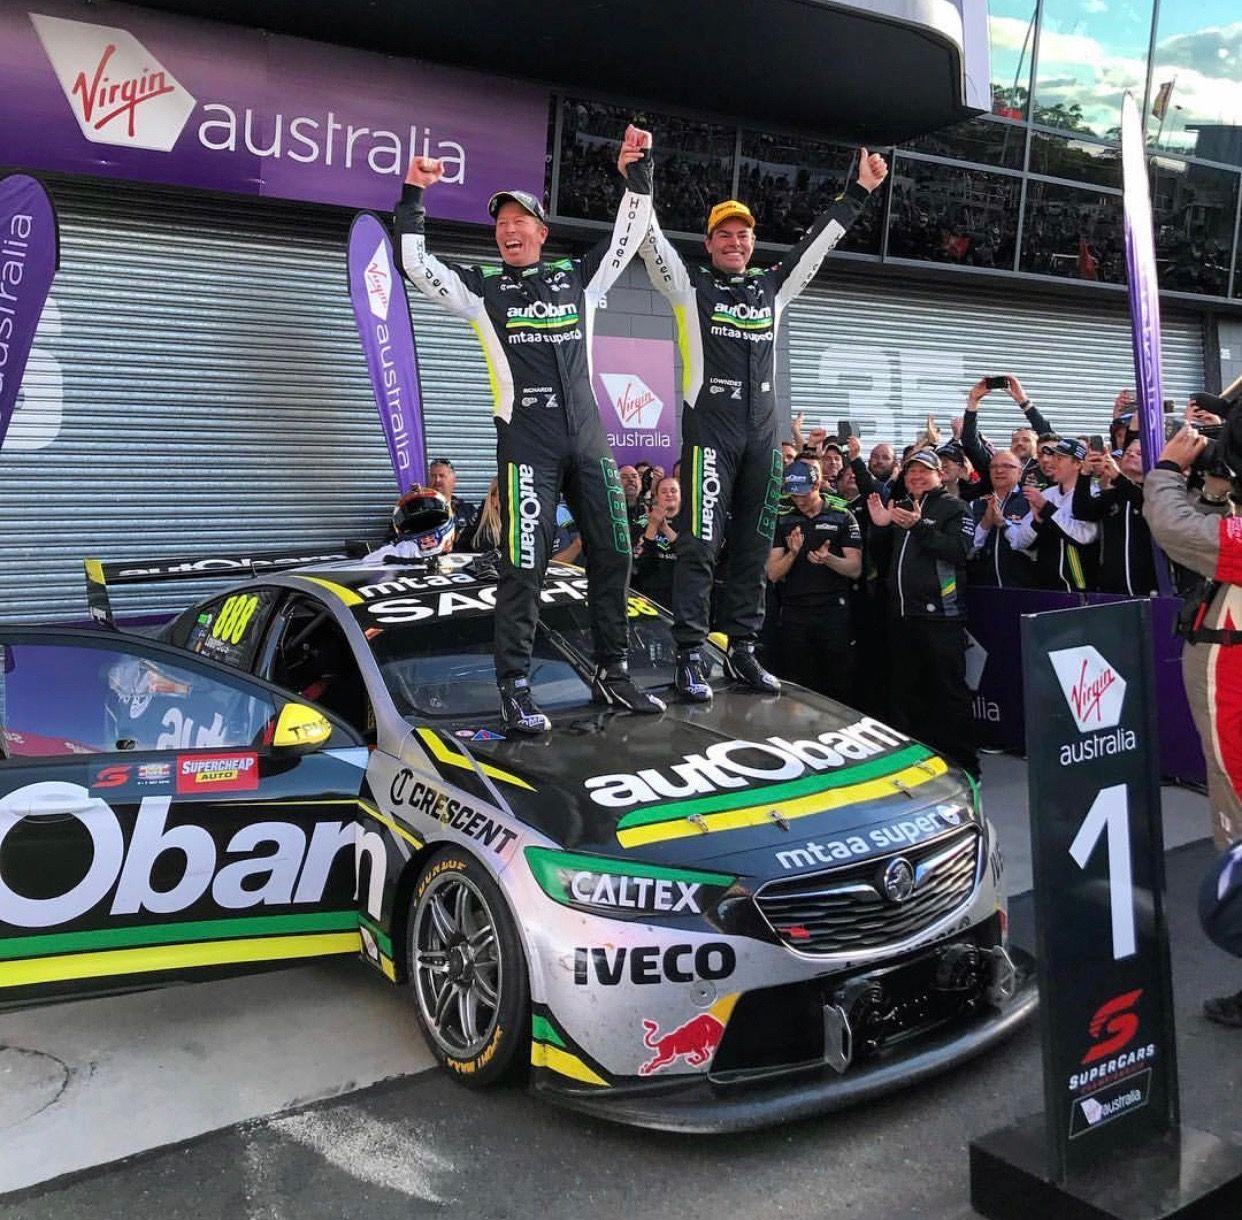 Craig Lowndes Stephen Richards 2018 Bathurst Winners On Ya Boys Super Cars V8 Supercars Australia Aussie Muscle Cars